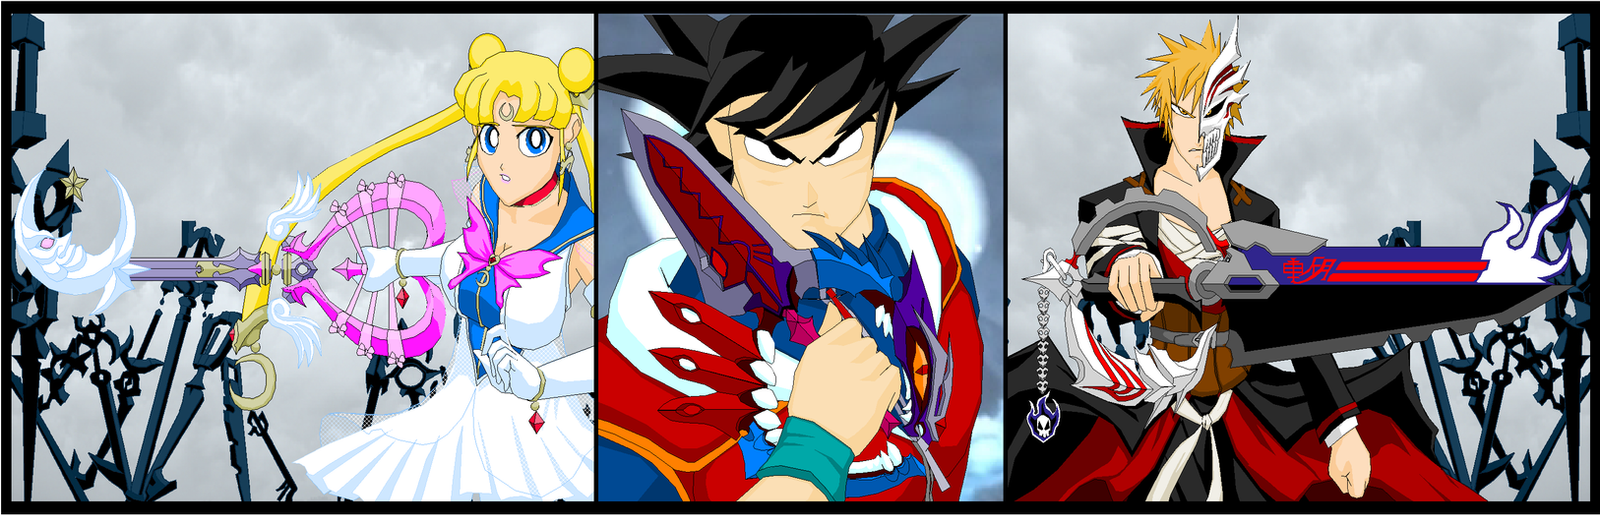 Keyblade Heroes by Tyrranux